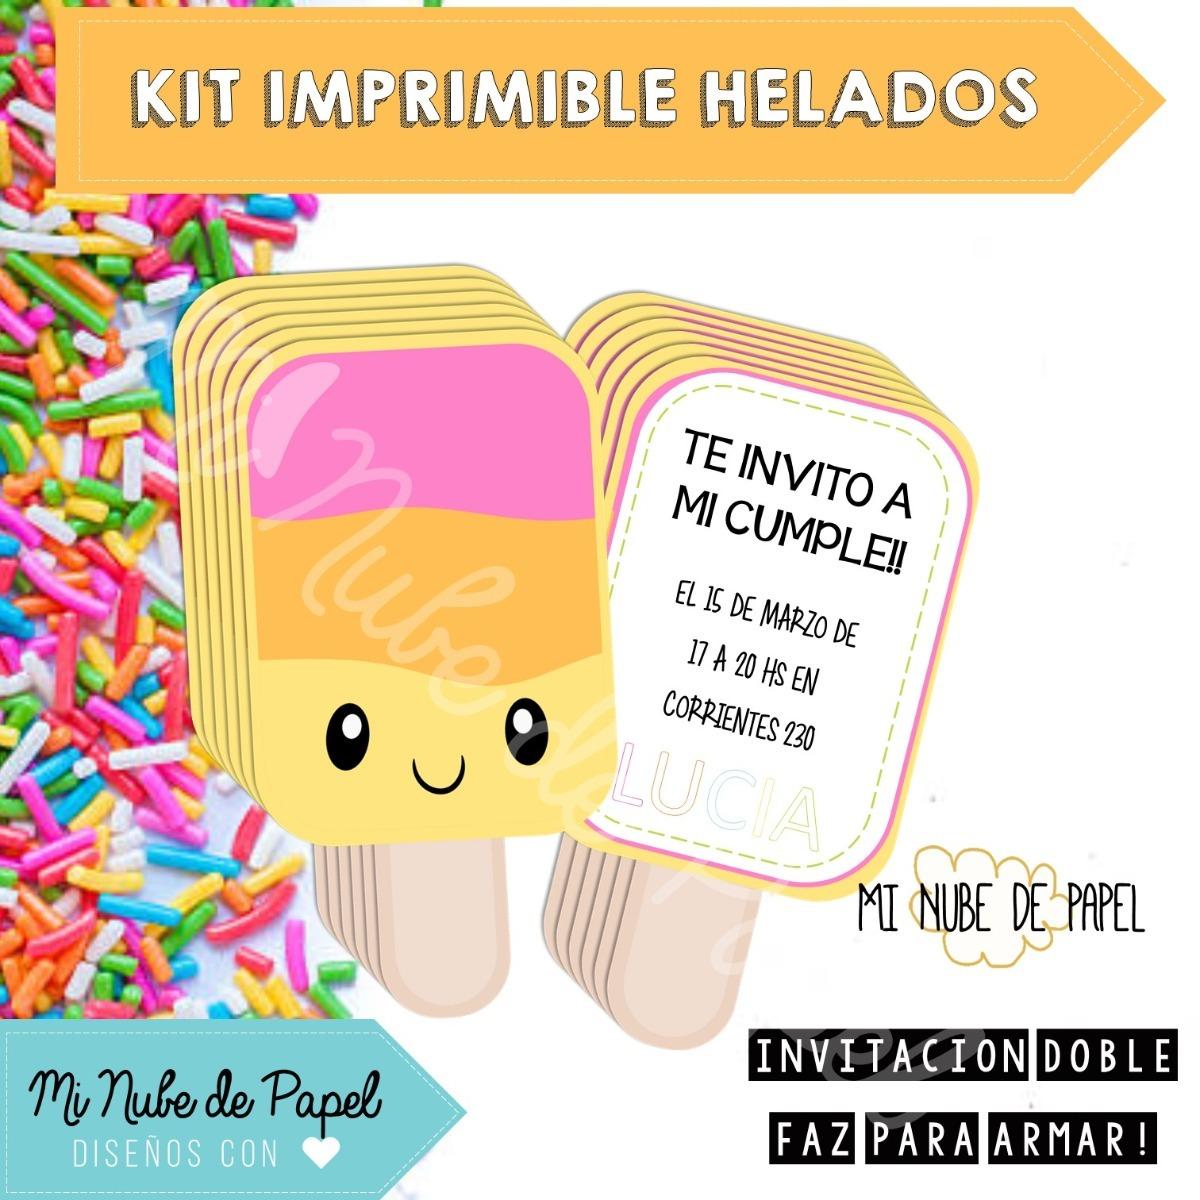 Kit Imprimible Helados Verano Kawaii Cumpleanos Candy Bar 200